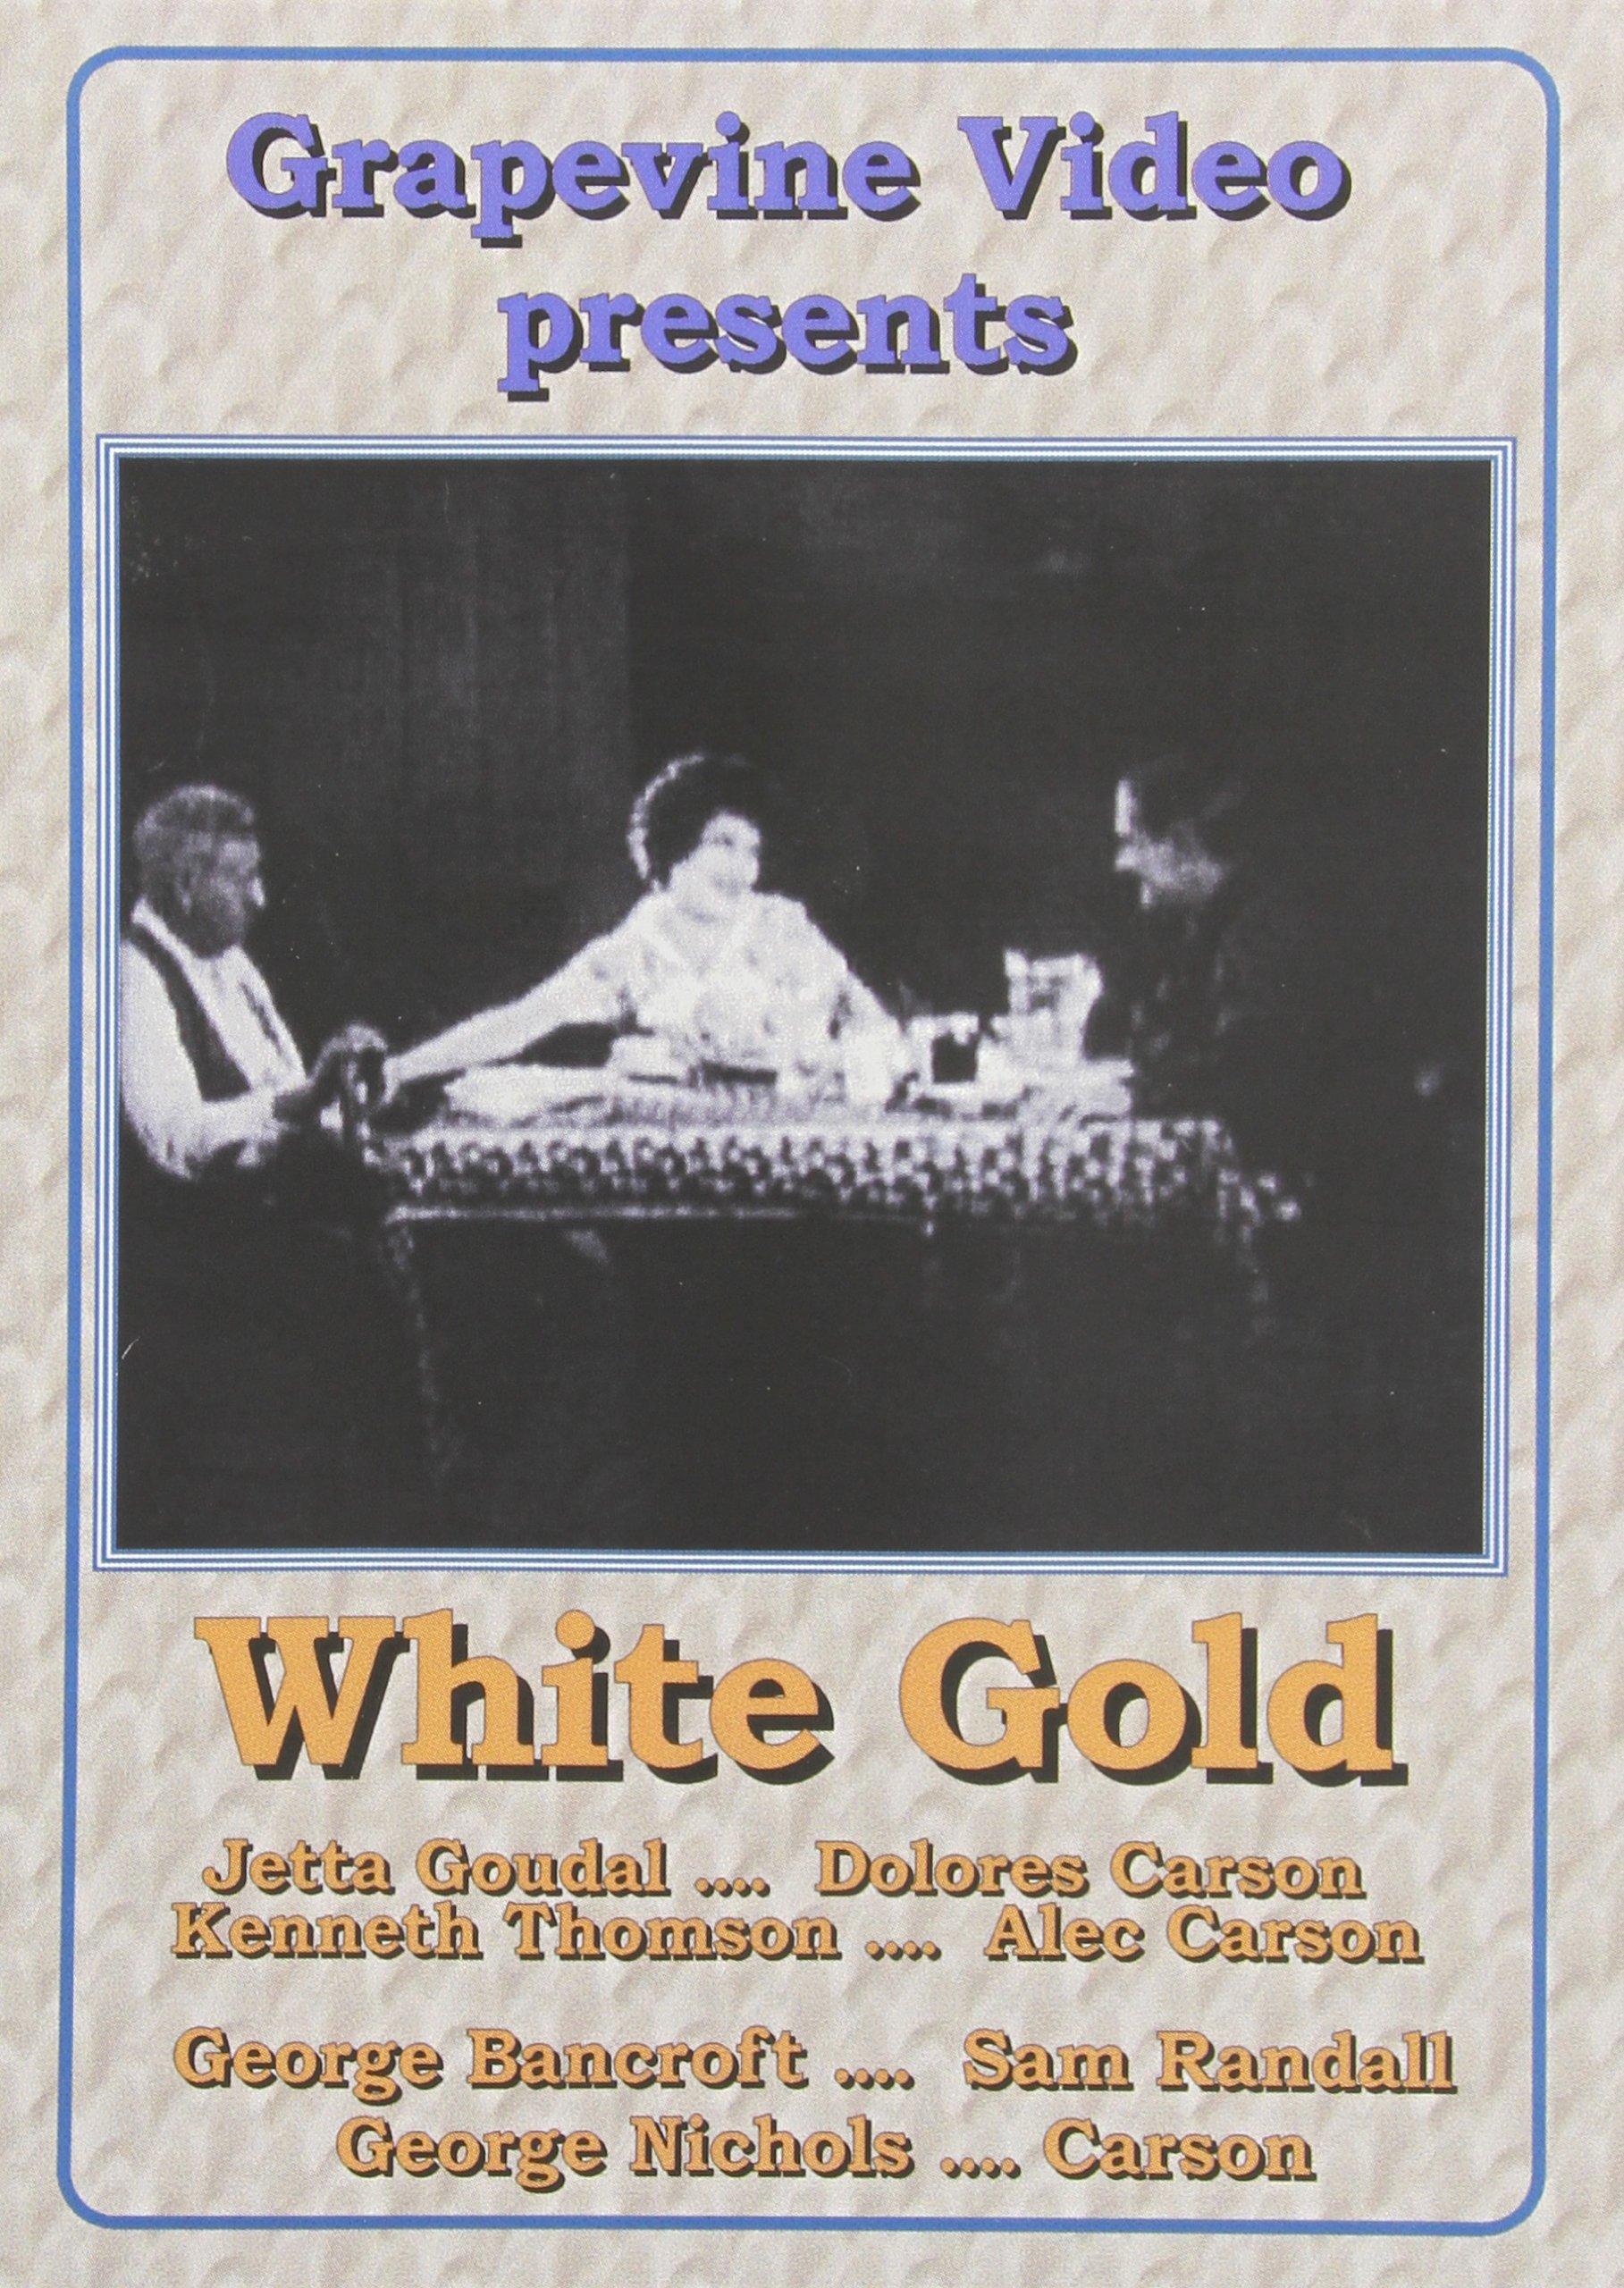 DVD : White Gold (Black & White, Silent Movie)